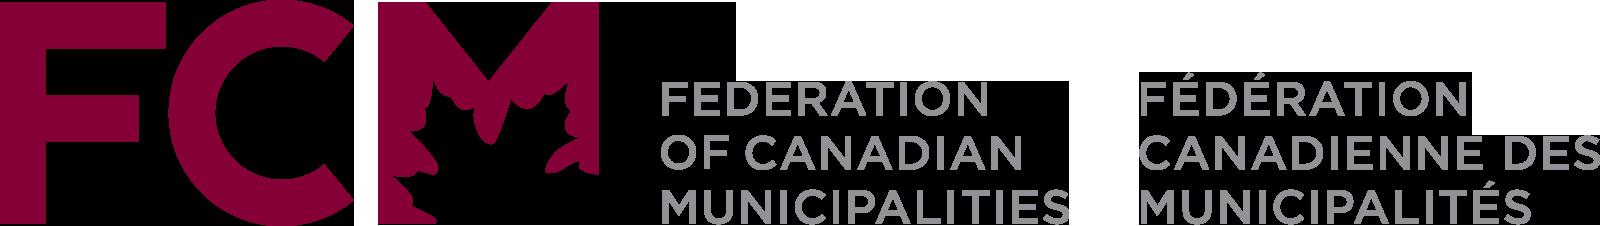 FCM_Logo_TRANSPARENT.png